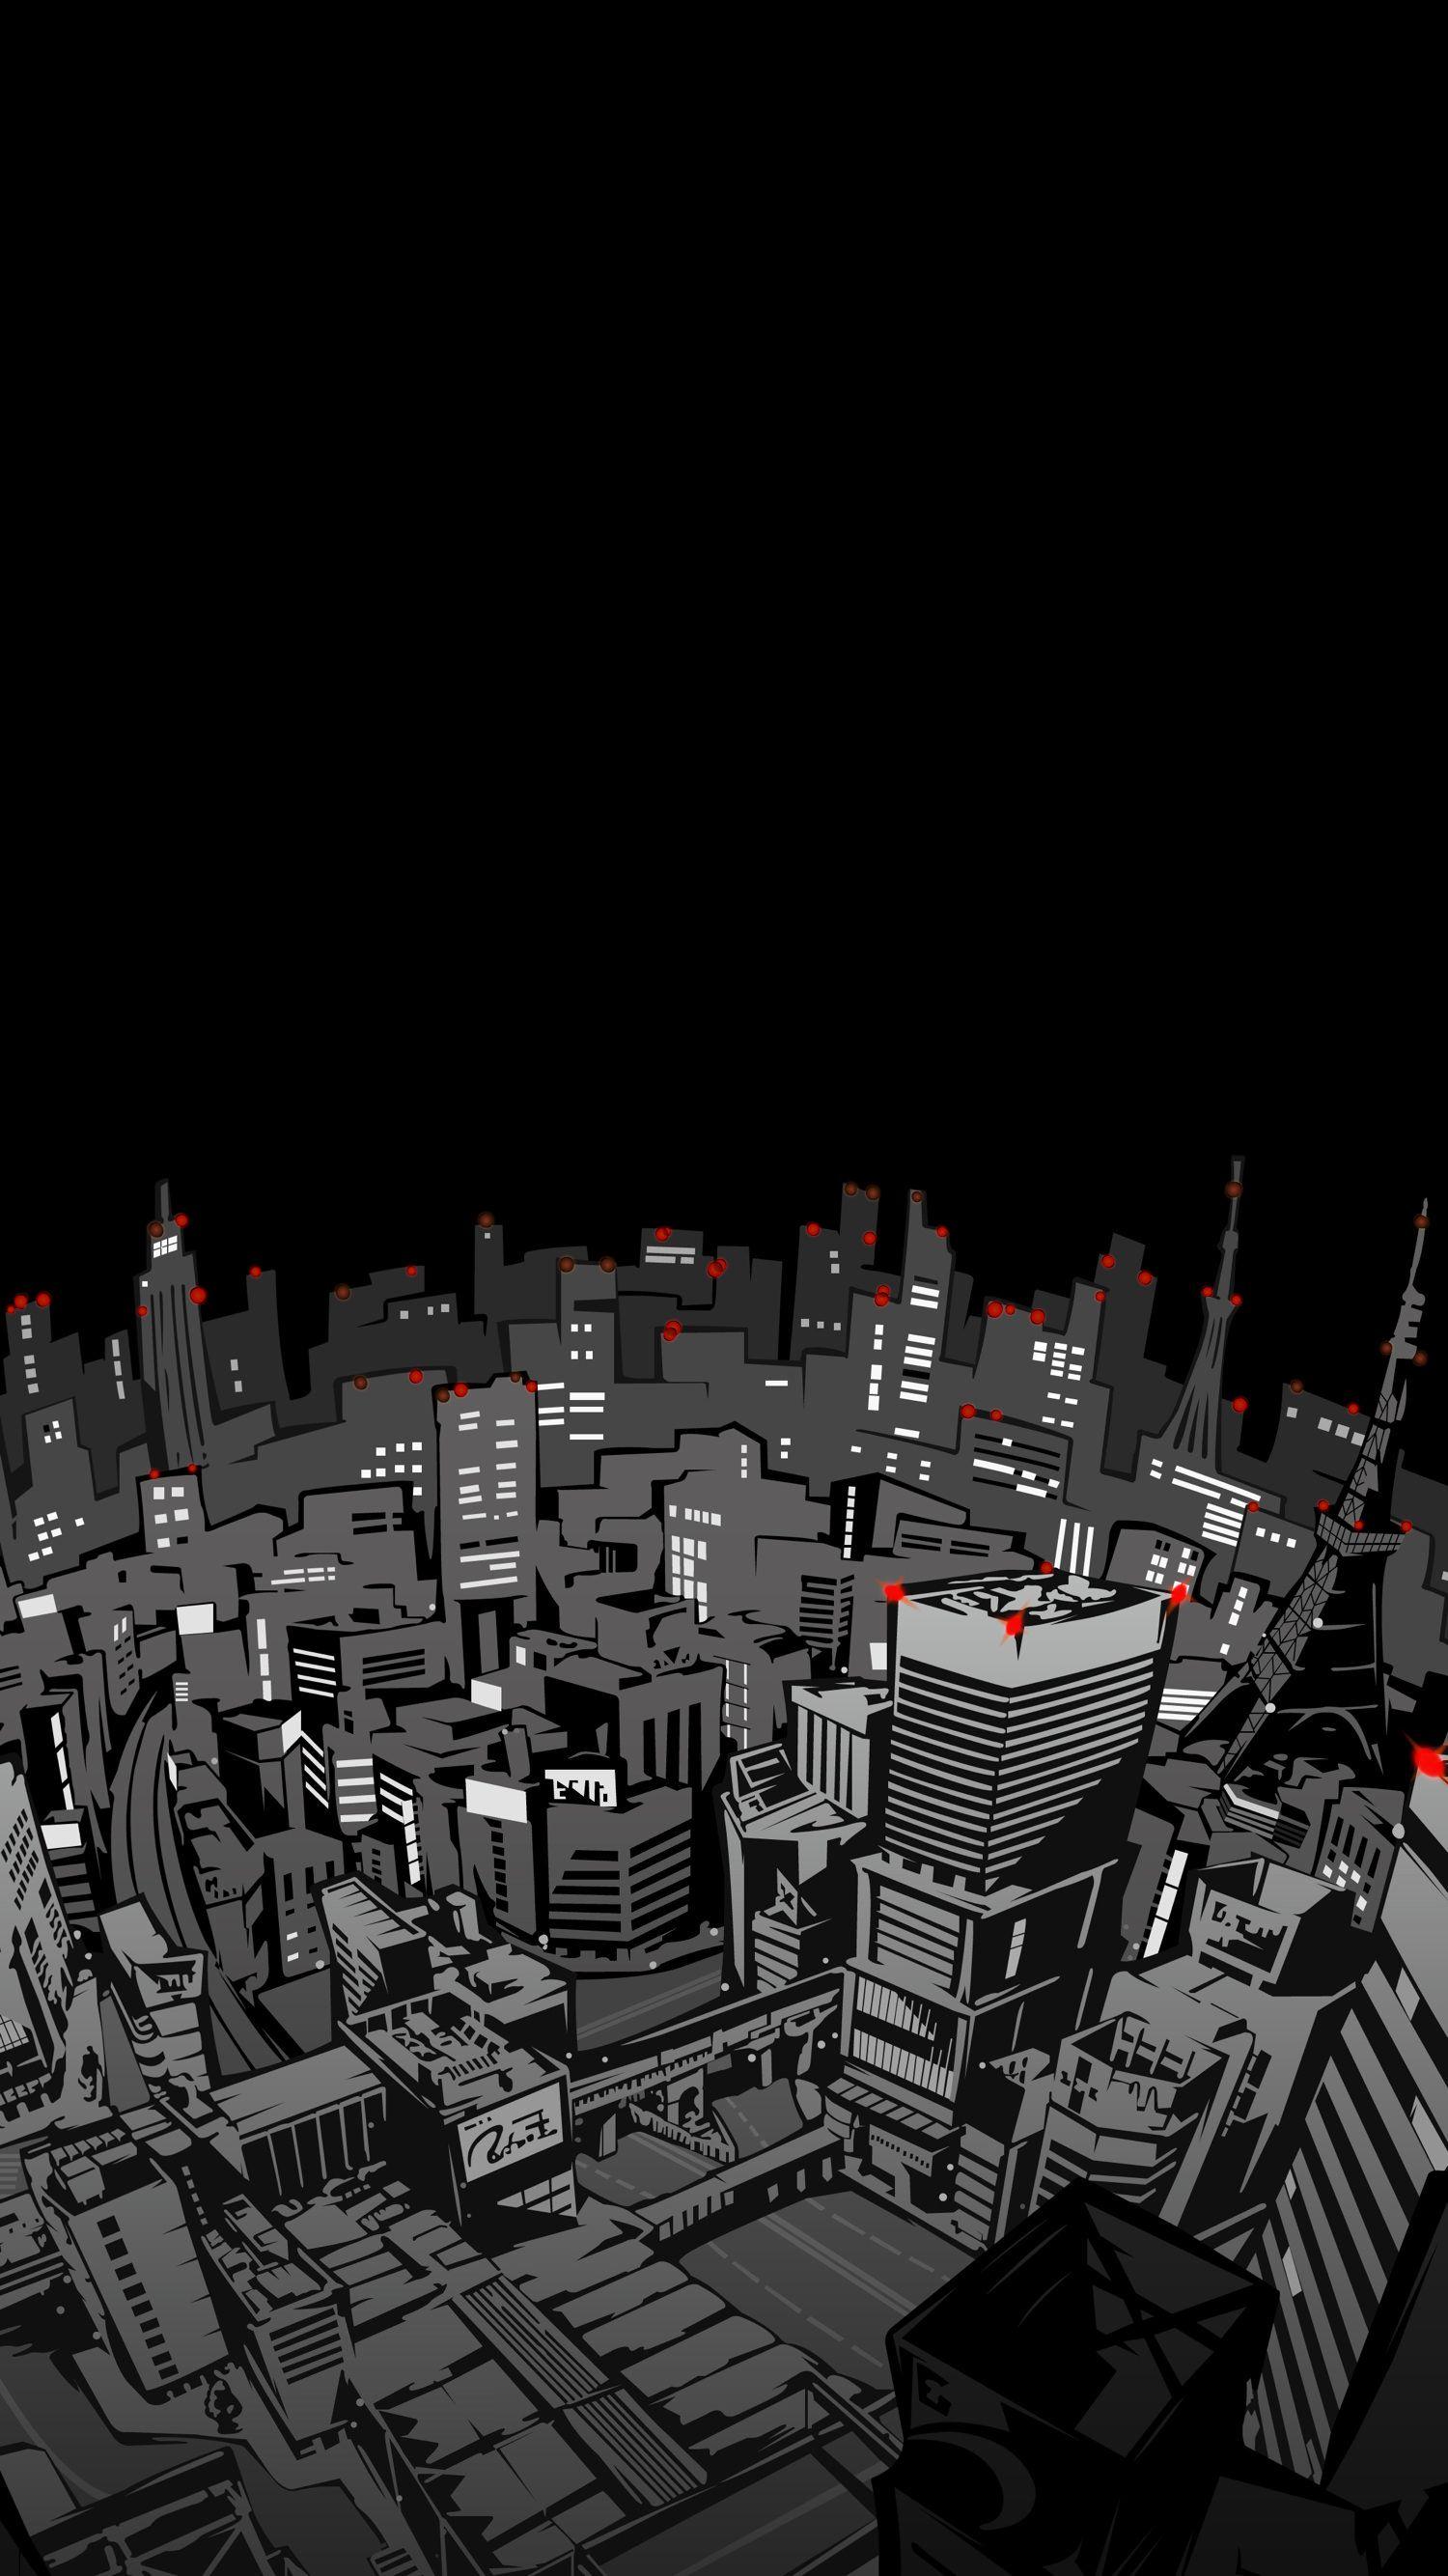 Persona 5 Tokyo Download At Www Myfavwallpaper Com